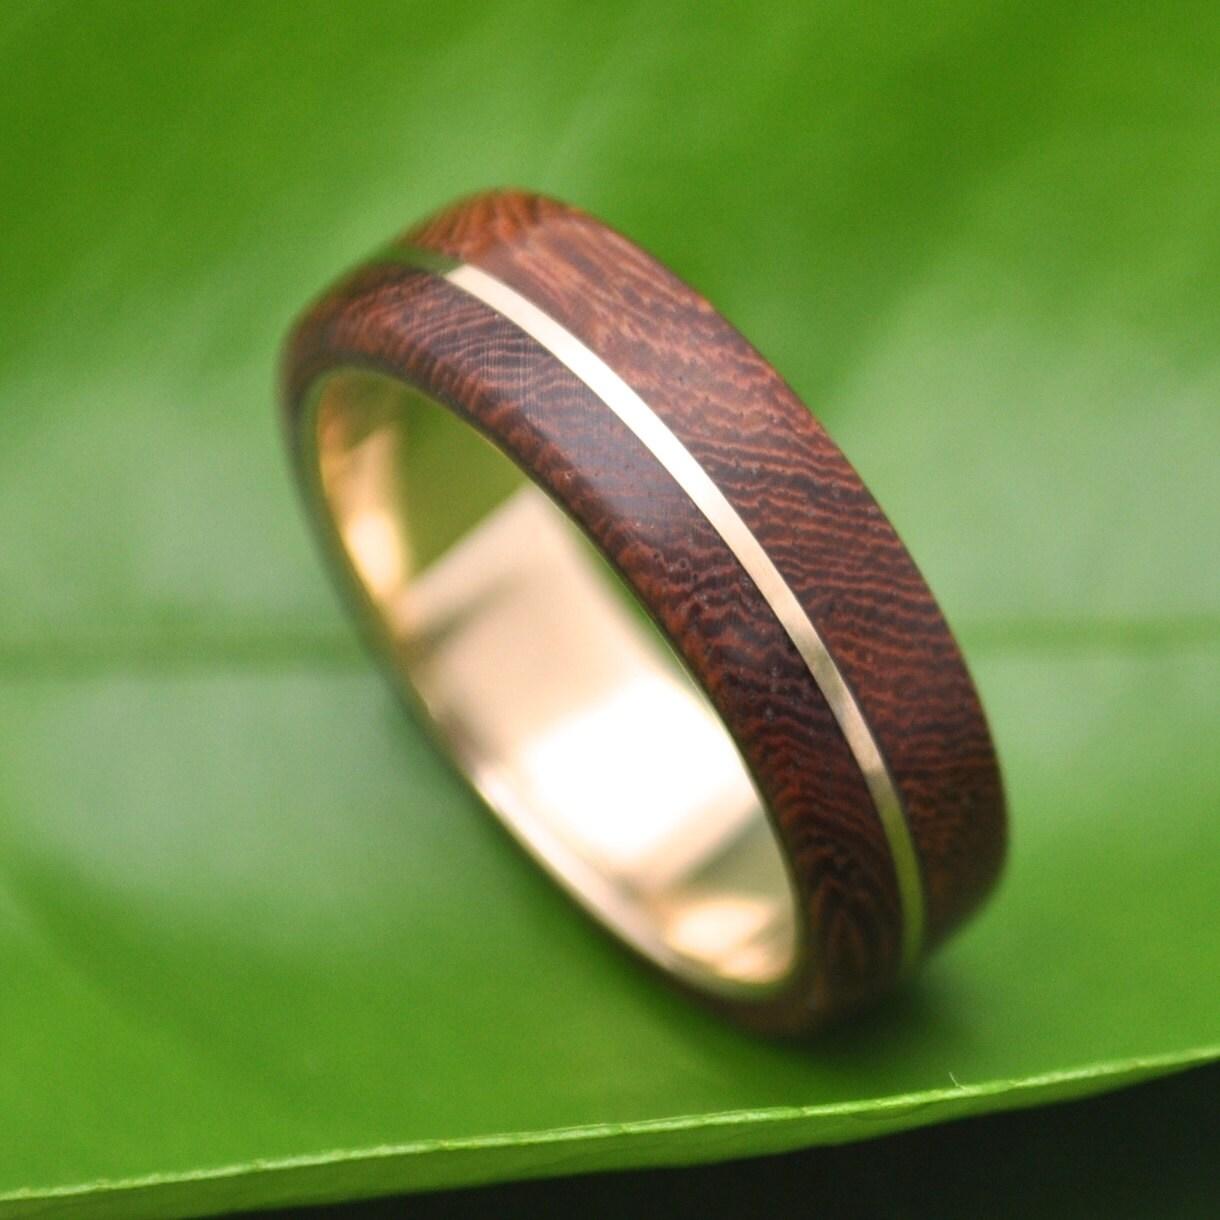 Ehering Holz Gold Eheringe Trauringe Holz Und Silberringe Briar